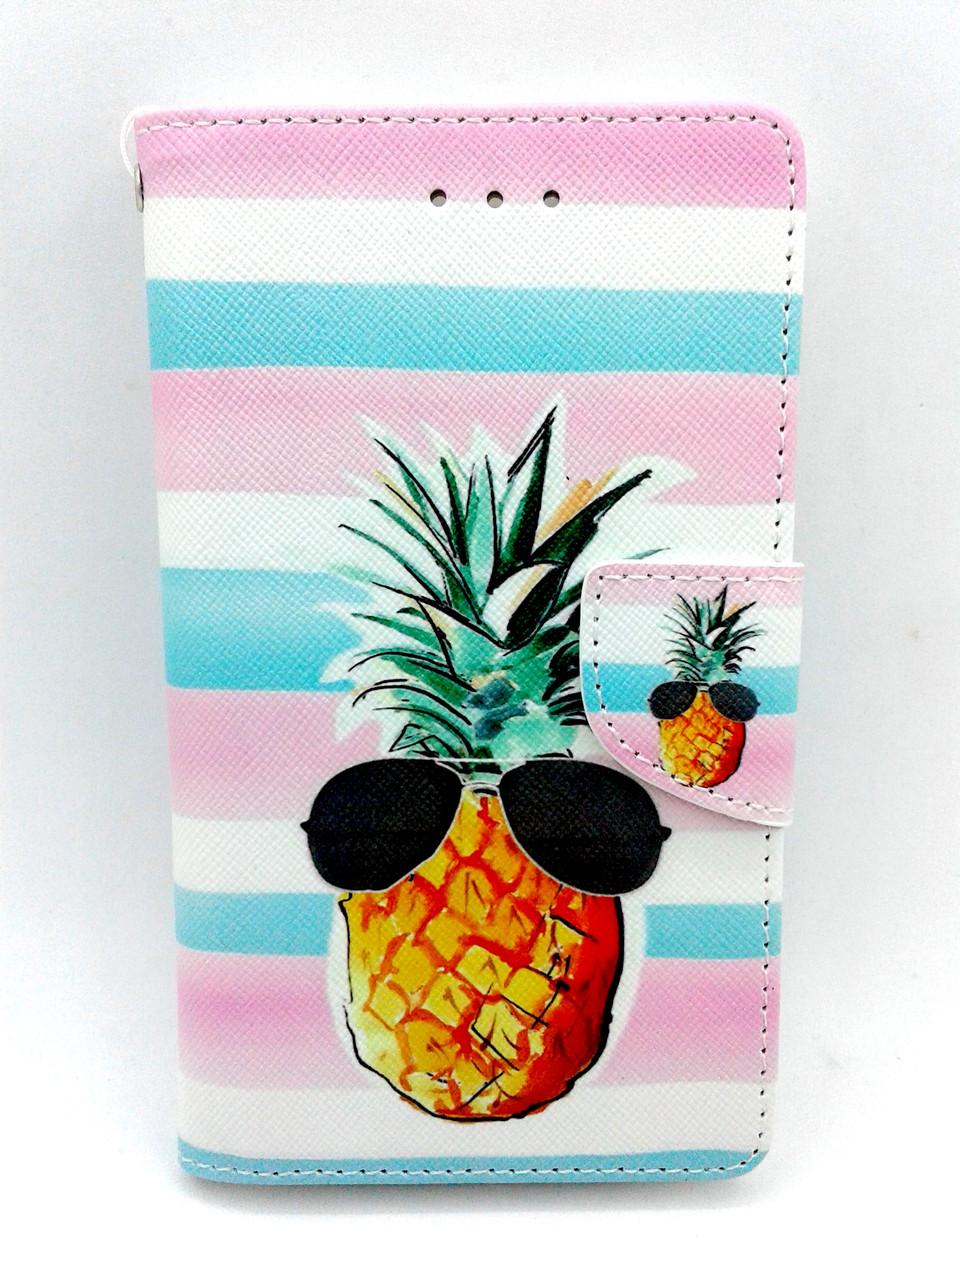 "Чехол-книжка 4you Art Print 4.0""-4.4"" Pineapple универсальная ТОП Продаж! Новинка!"